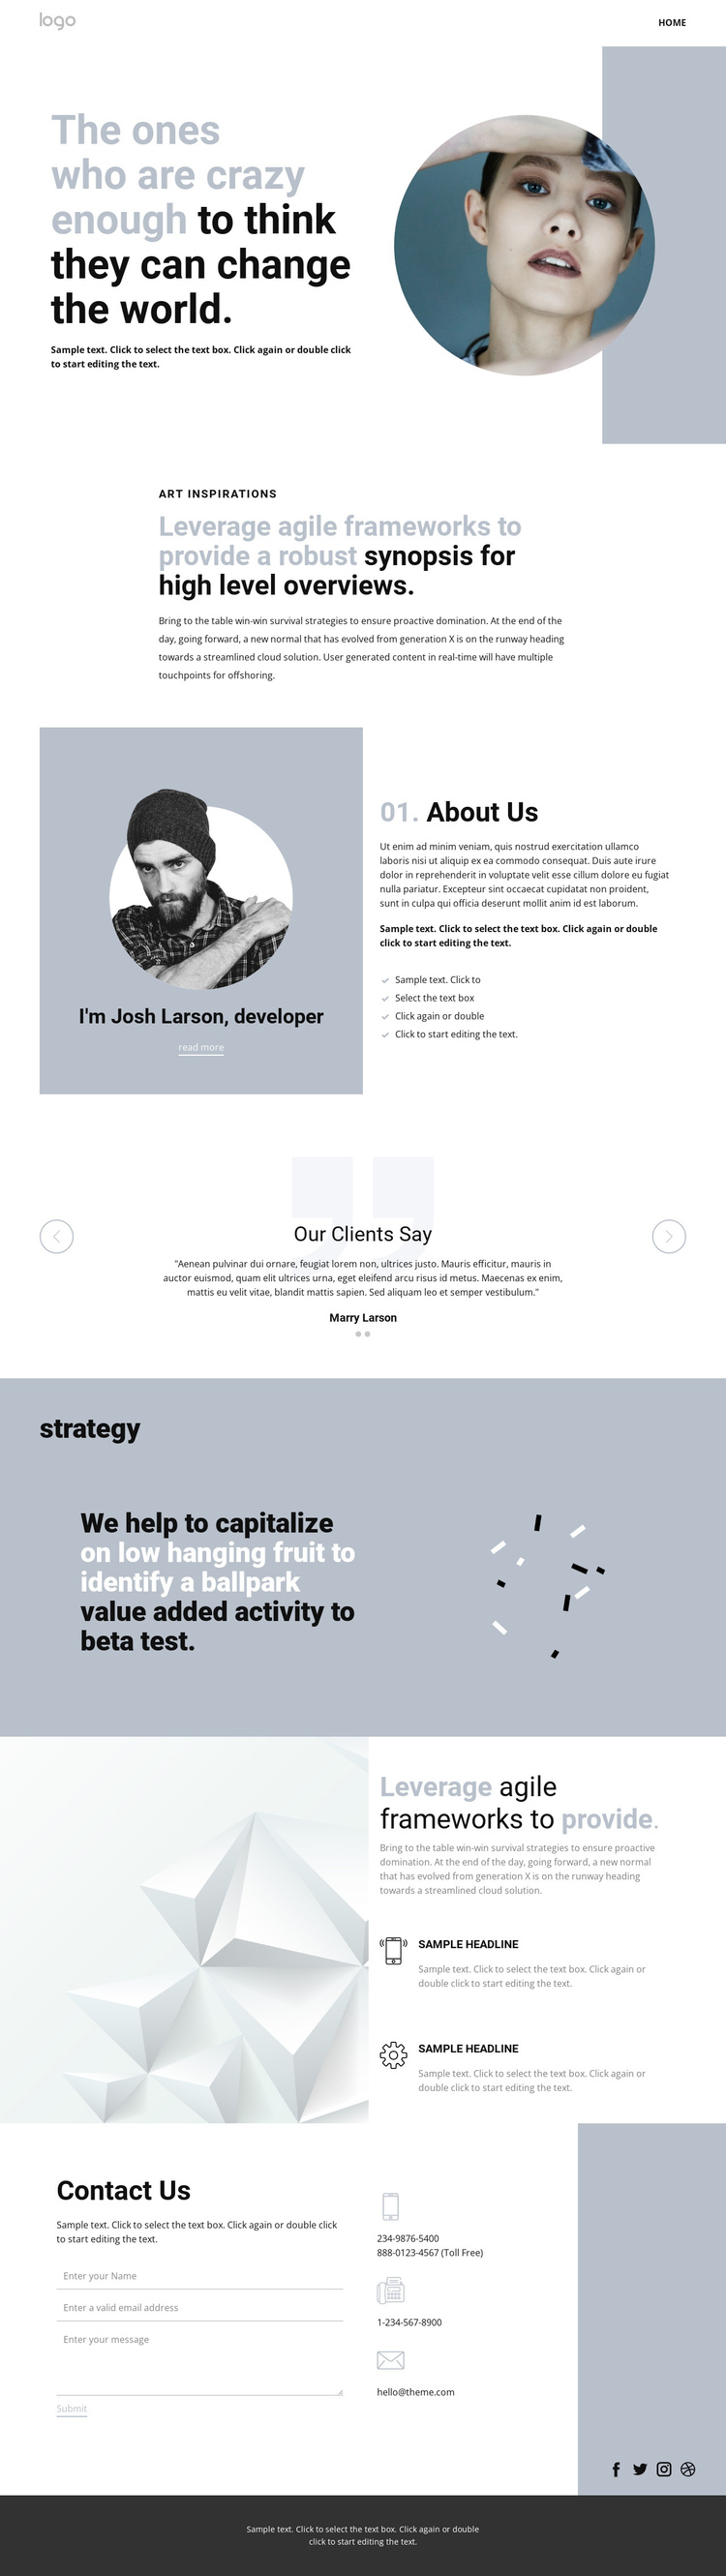 Creative studio innovation art Website Builder Software